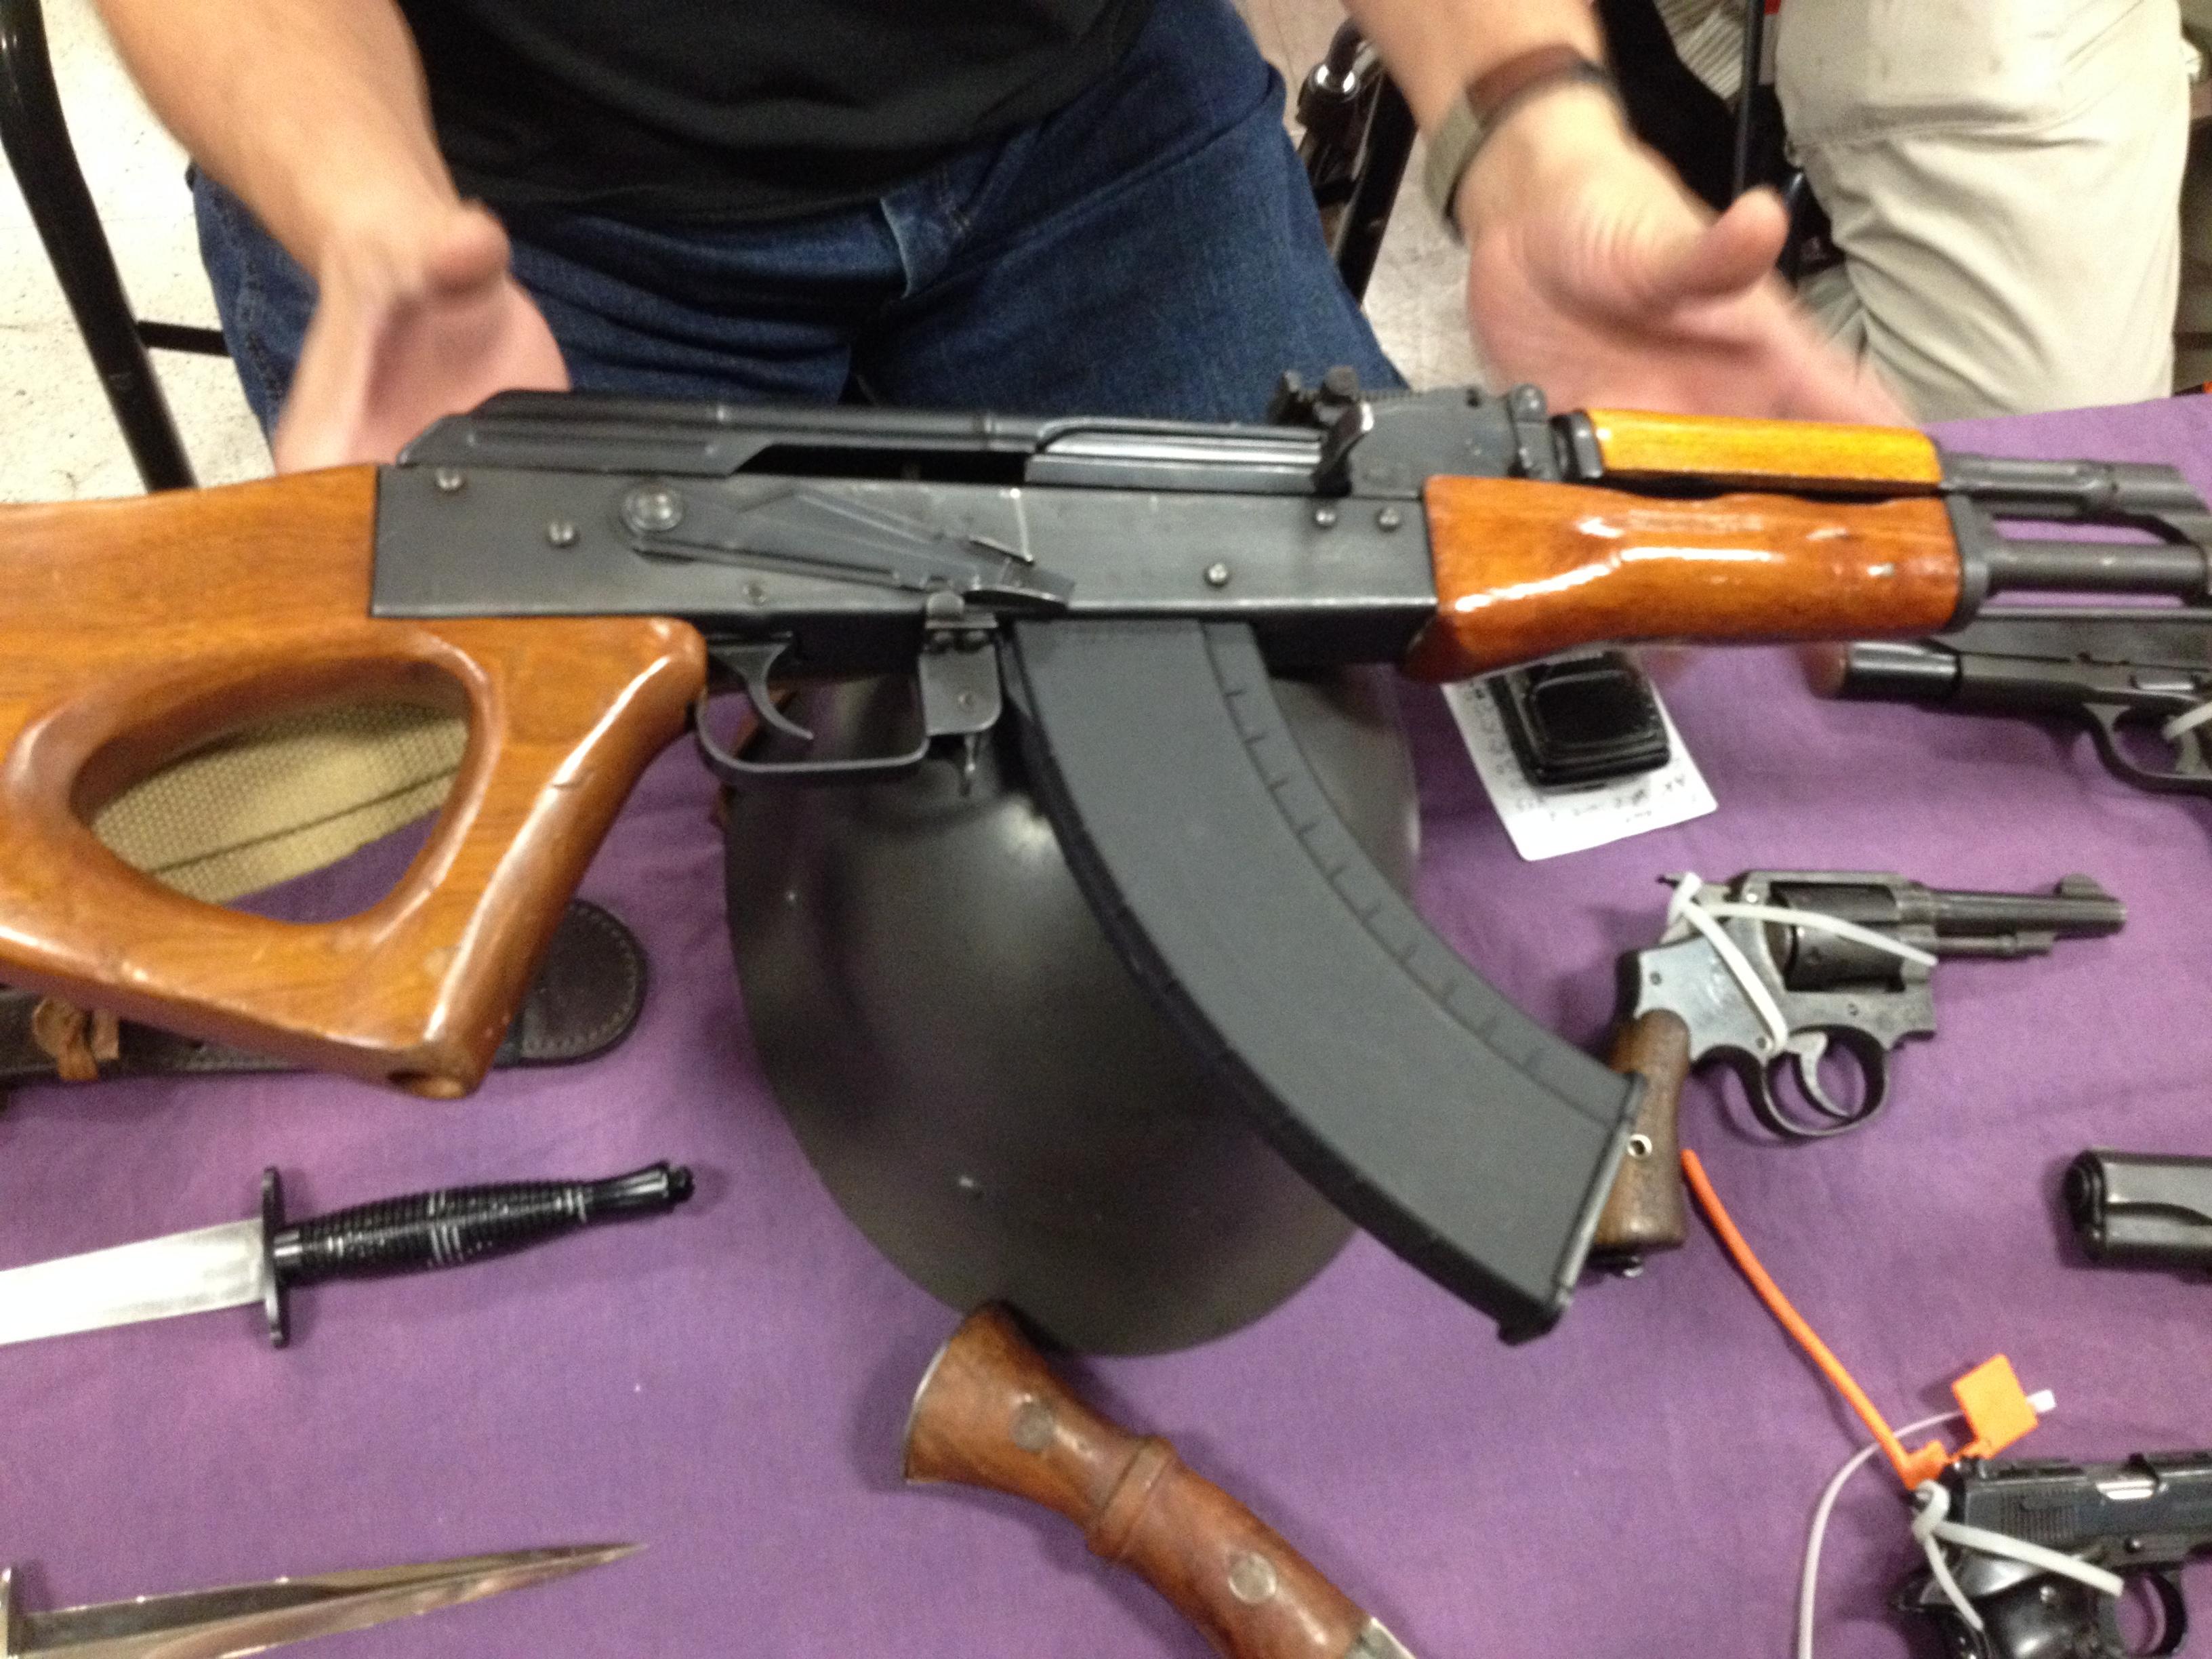 Gun show loophole - Wikipedia